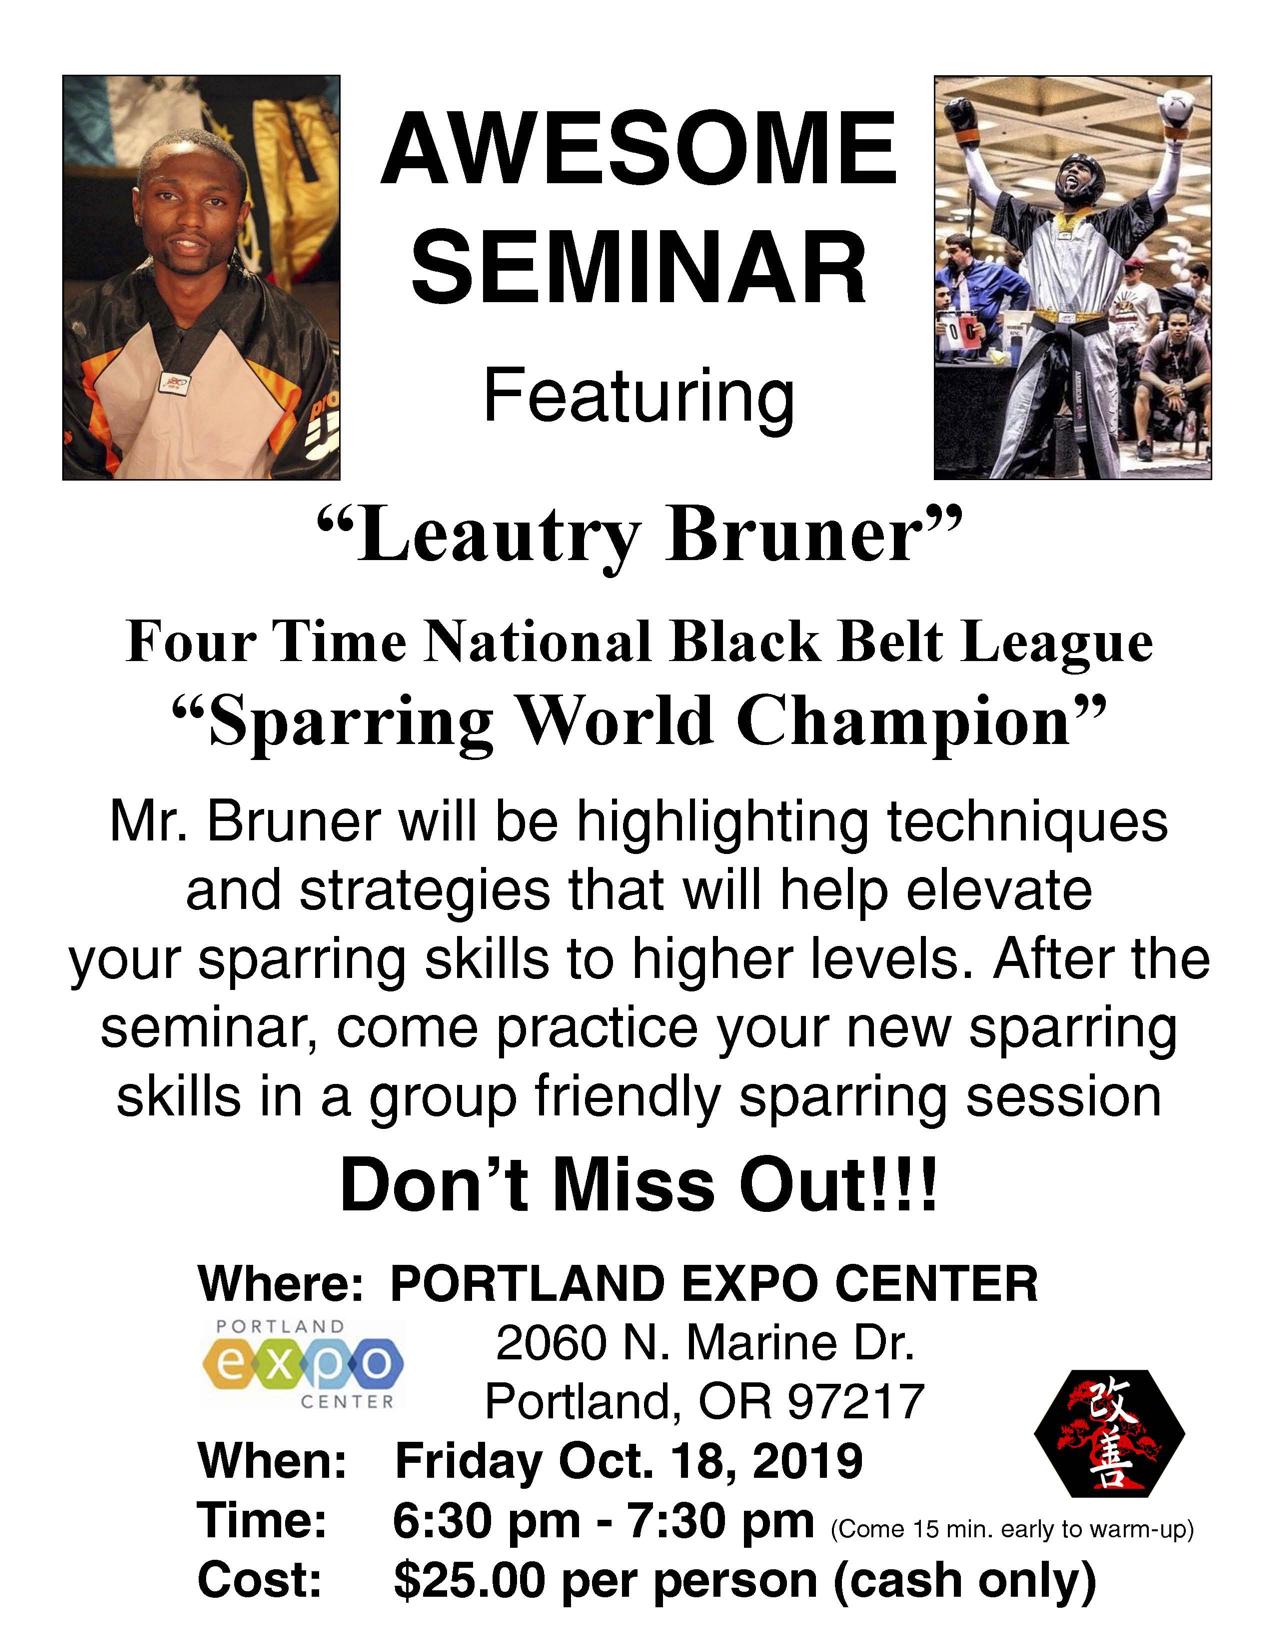 Awesome Seminar Flyer - 2019.jpg